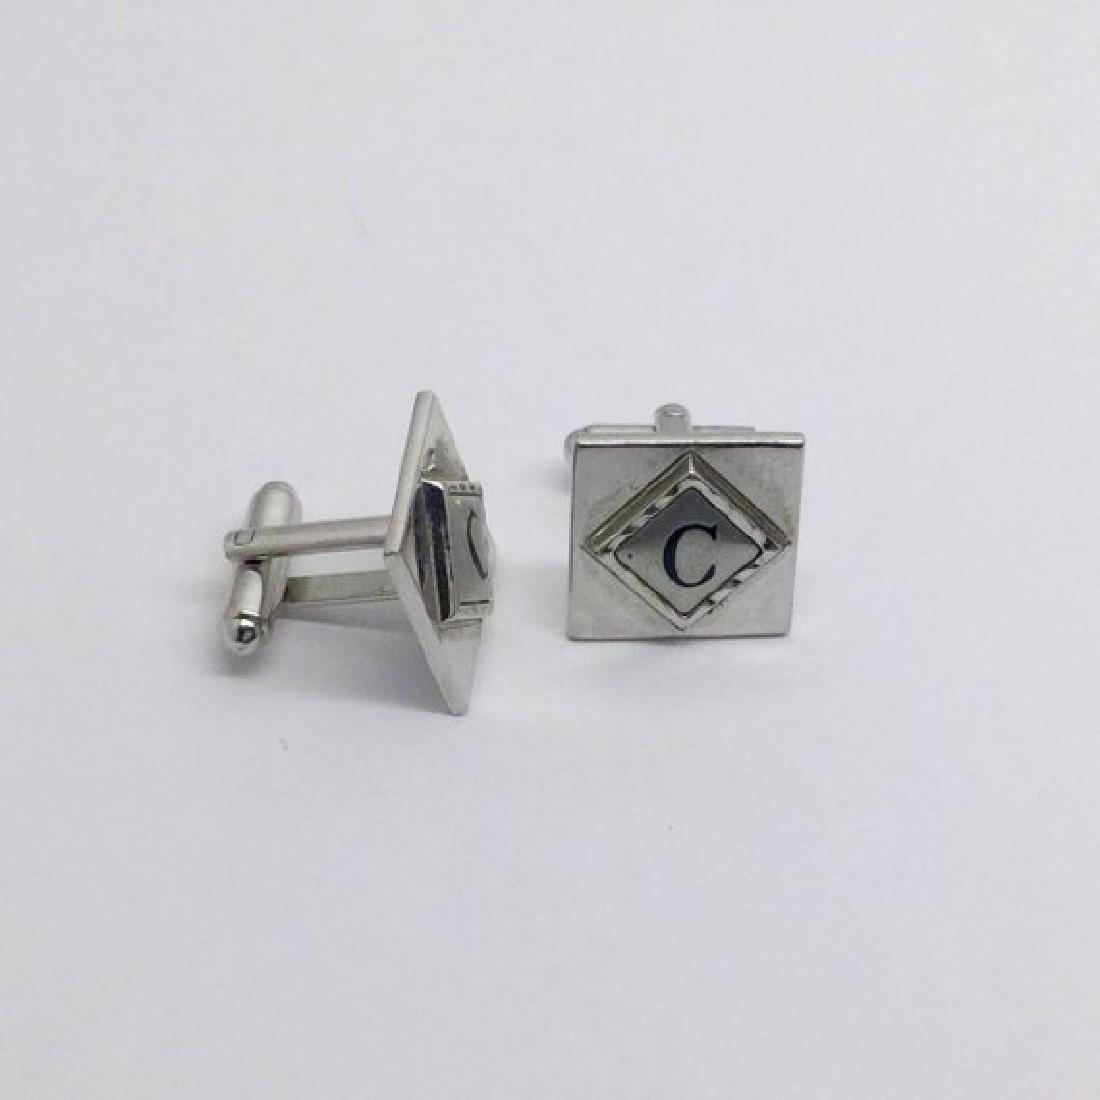 Shield Silver tone C cufflinks set #490 - 2